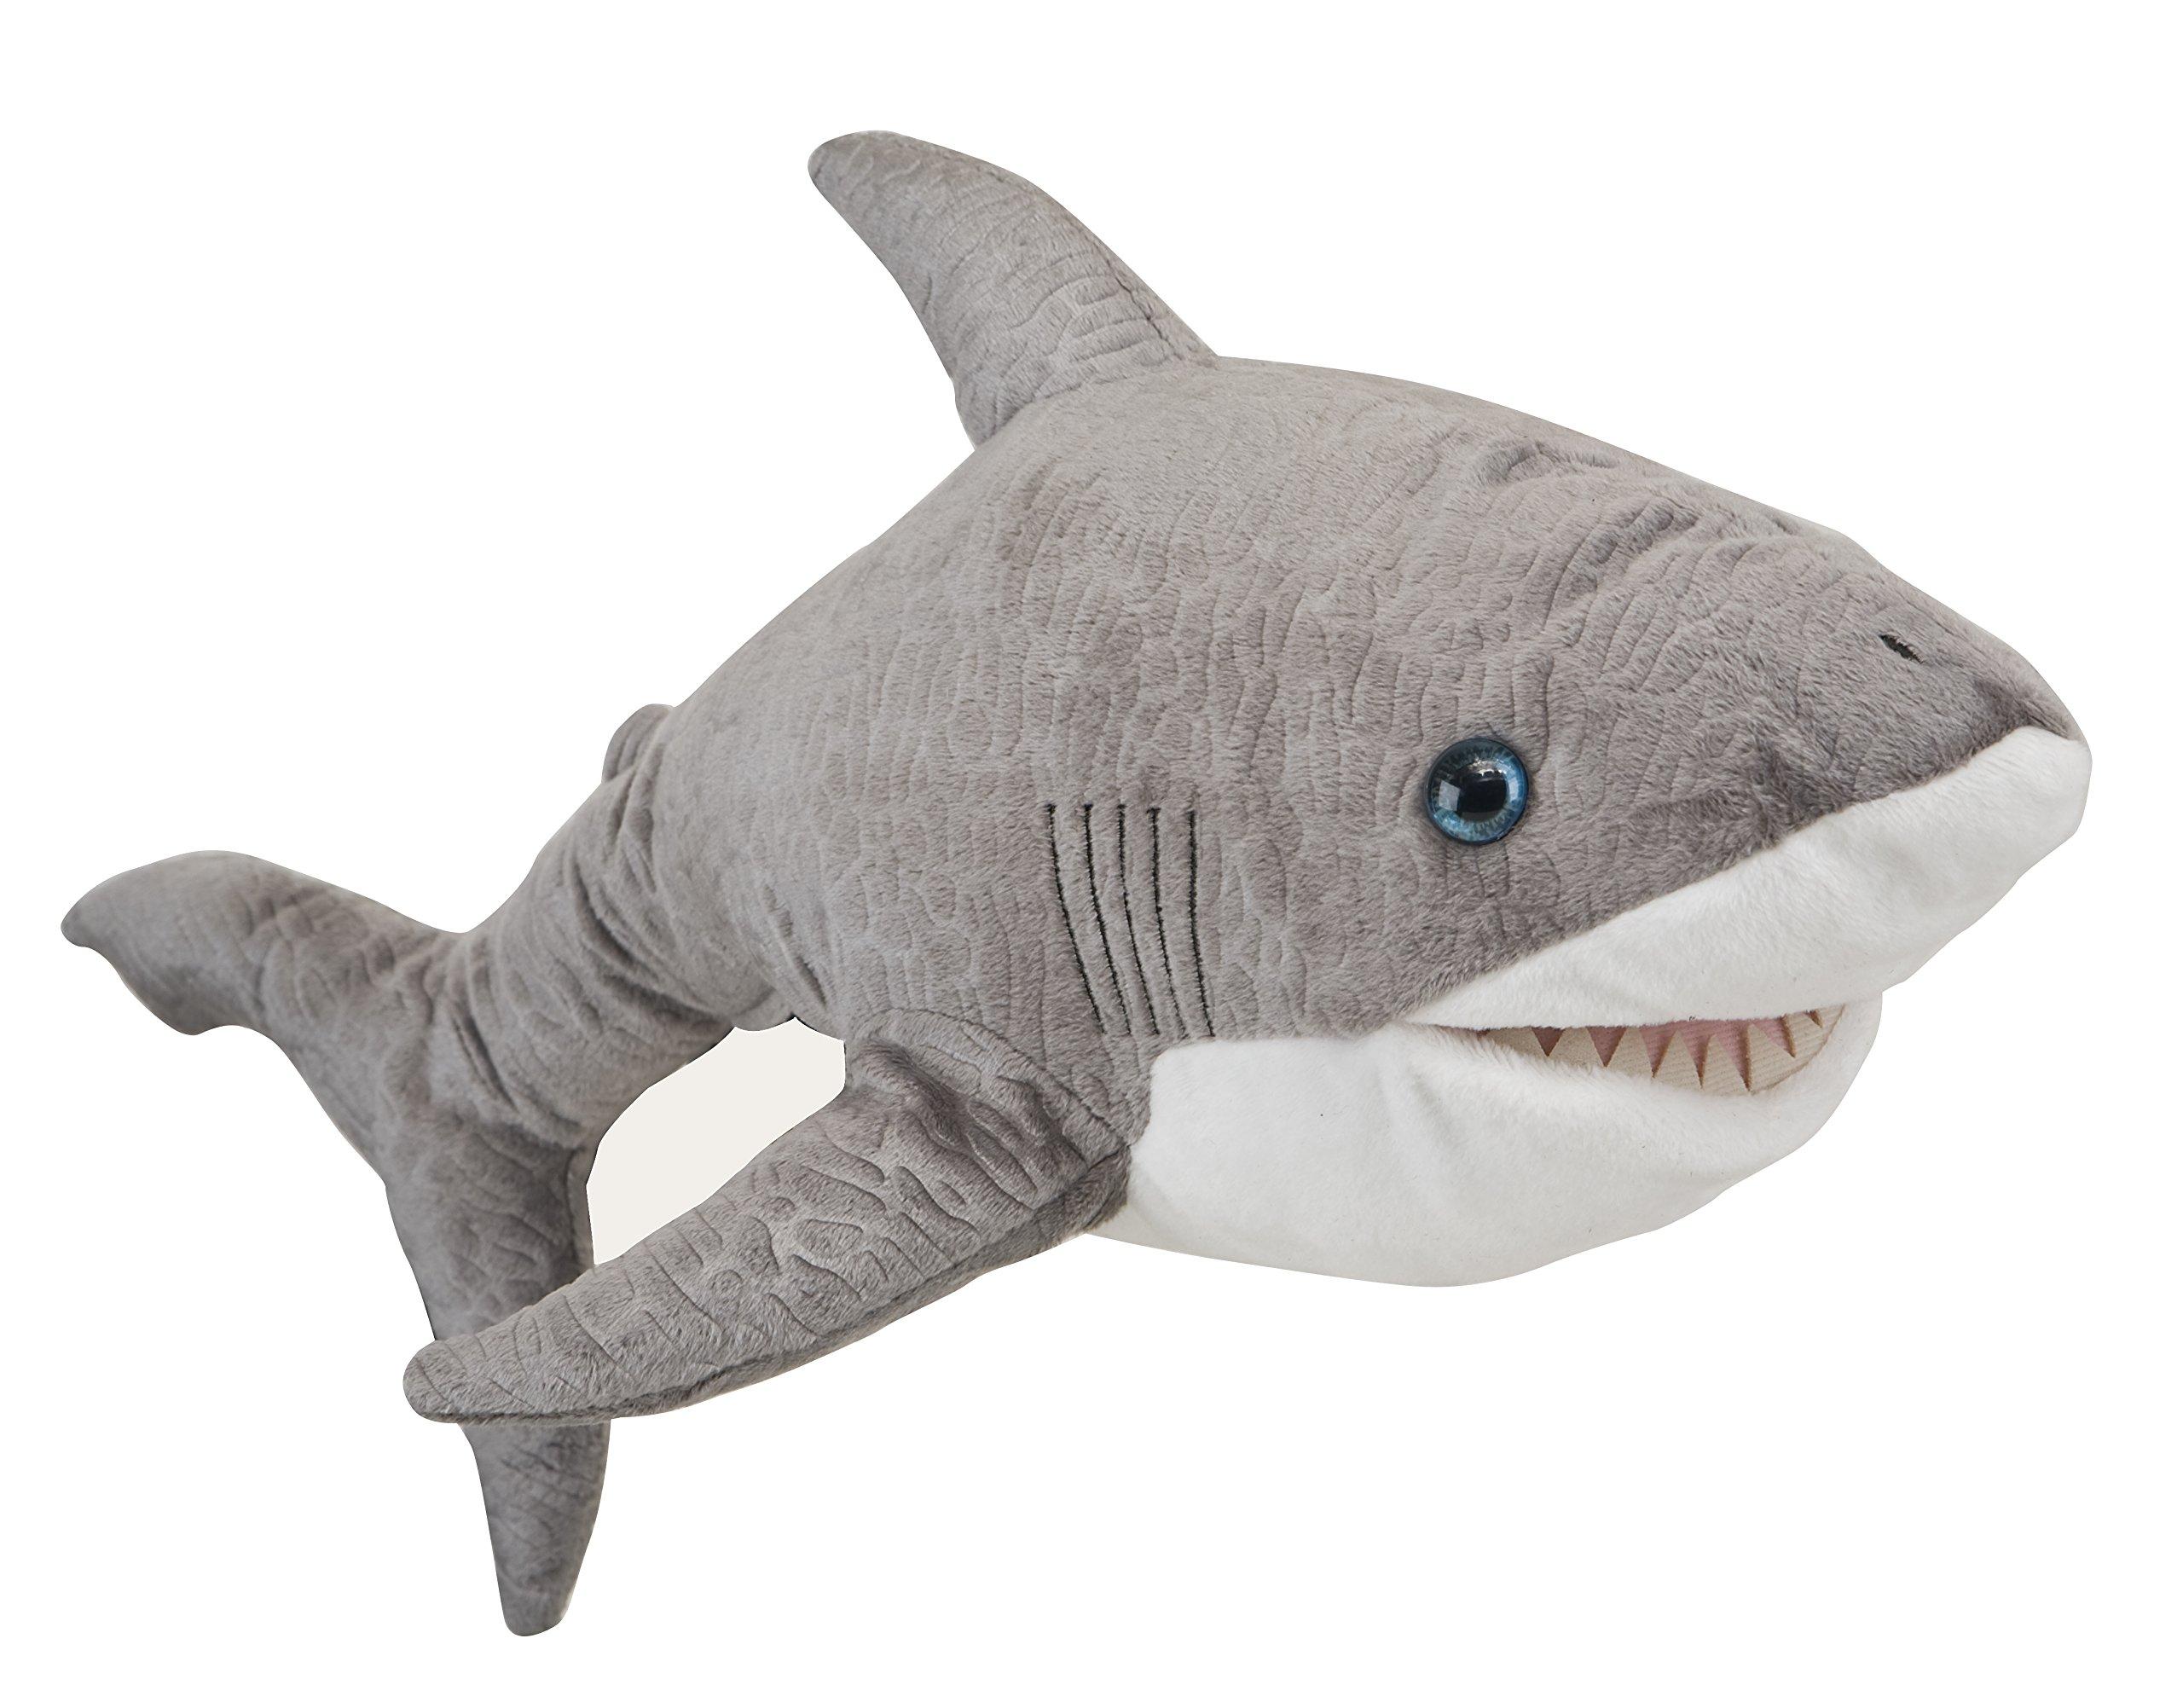 Oversized Shark Golf Head Cover